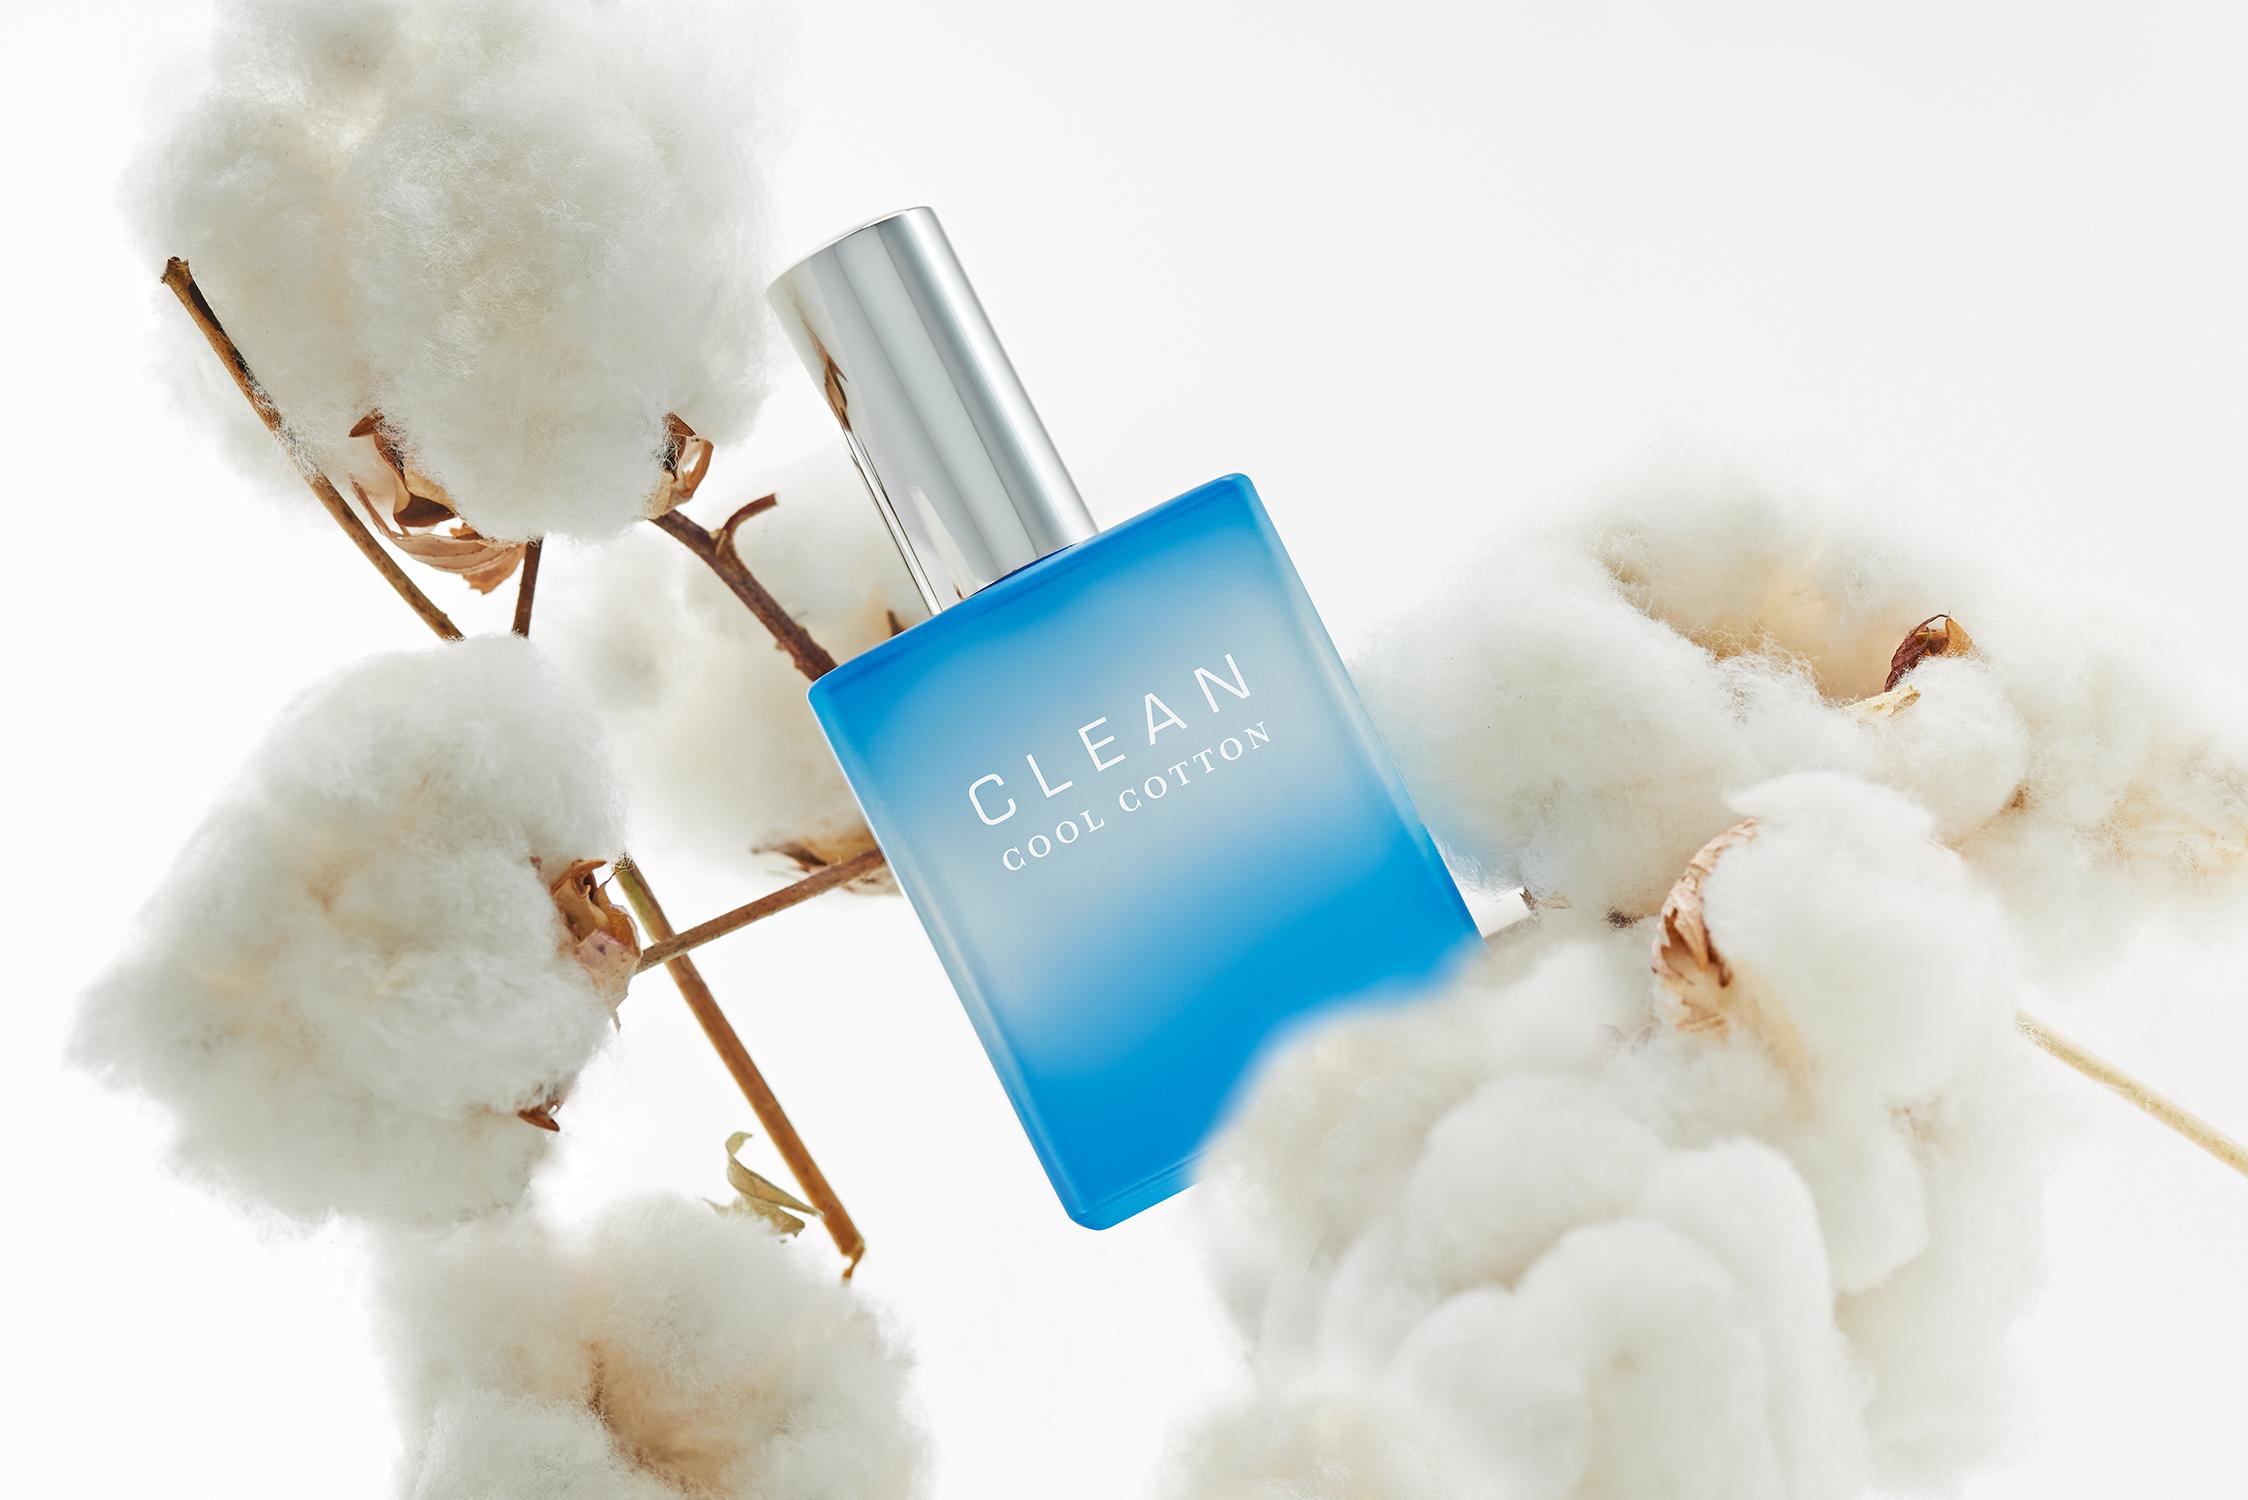 Clean Cool Cotton 1 v2.jpg